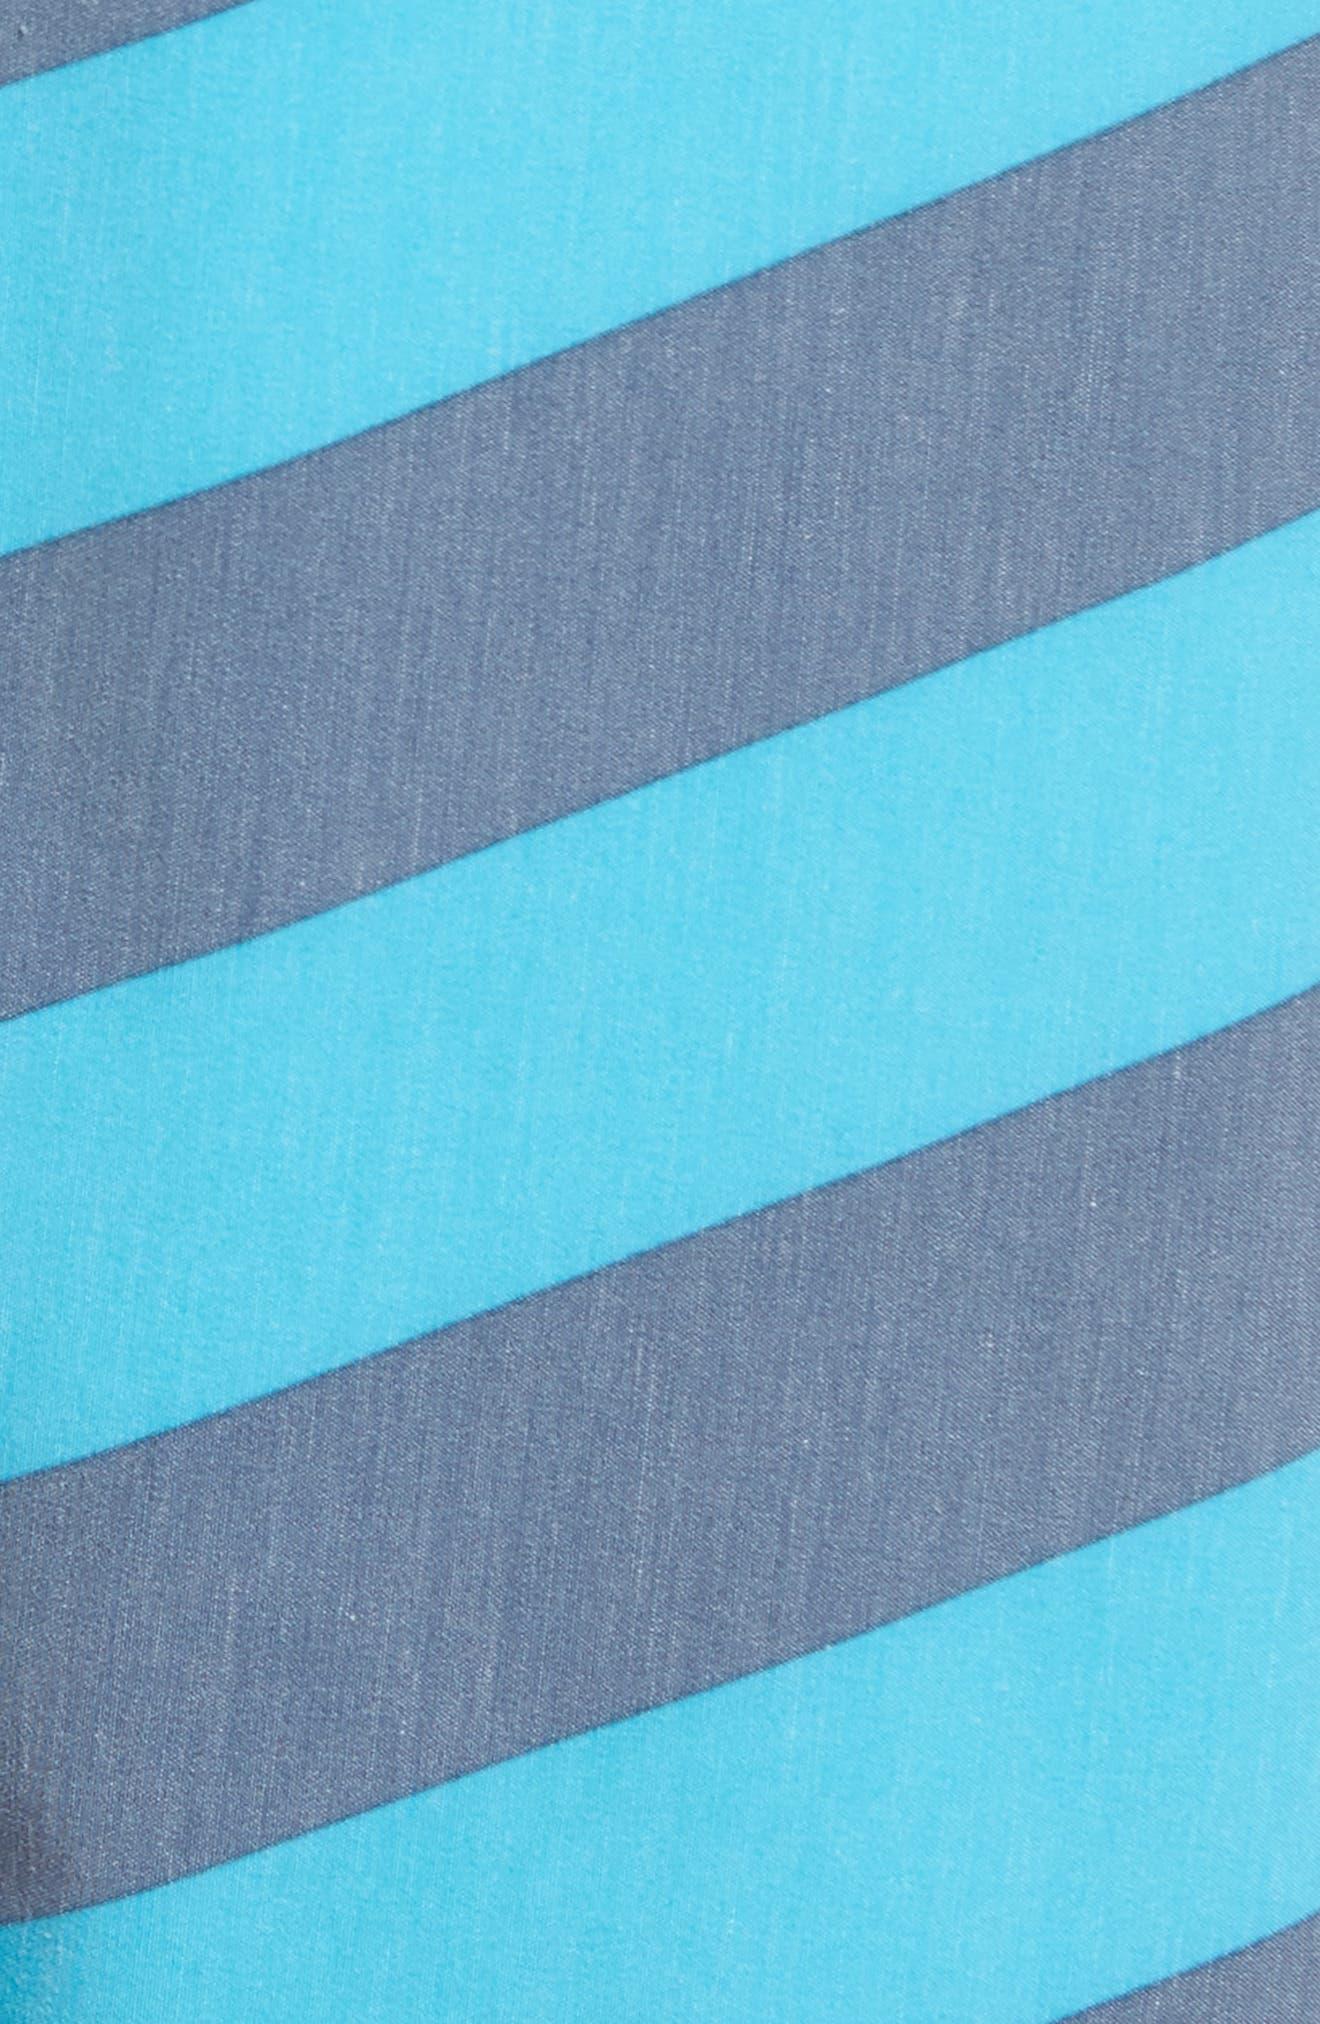 Stripey Slinger Board Shorts,                             Alternate thumbnail 37, color,